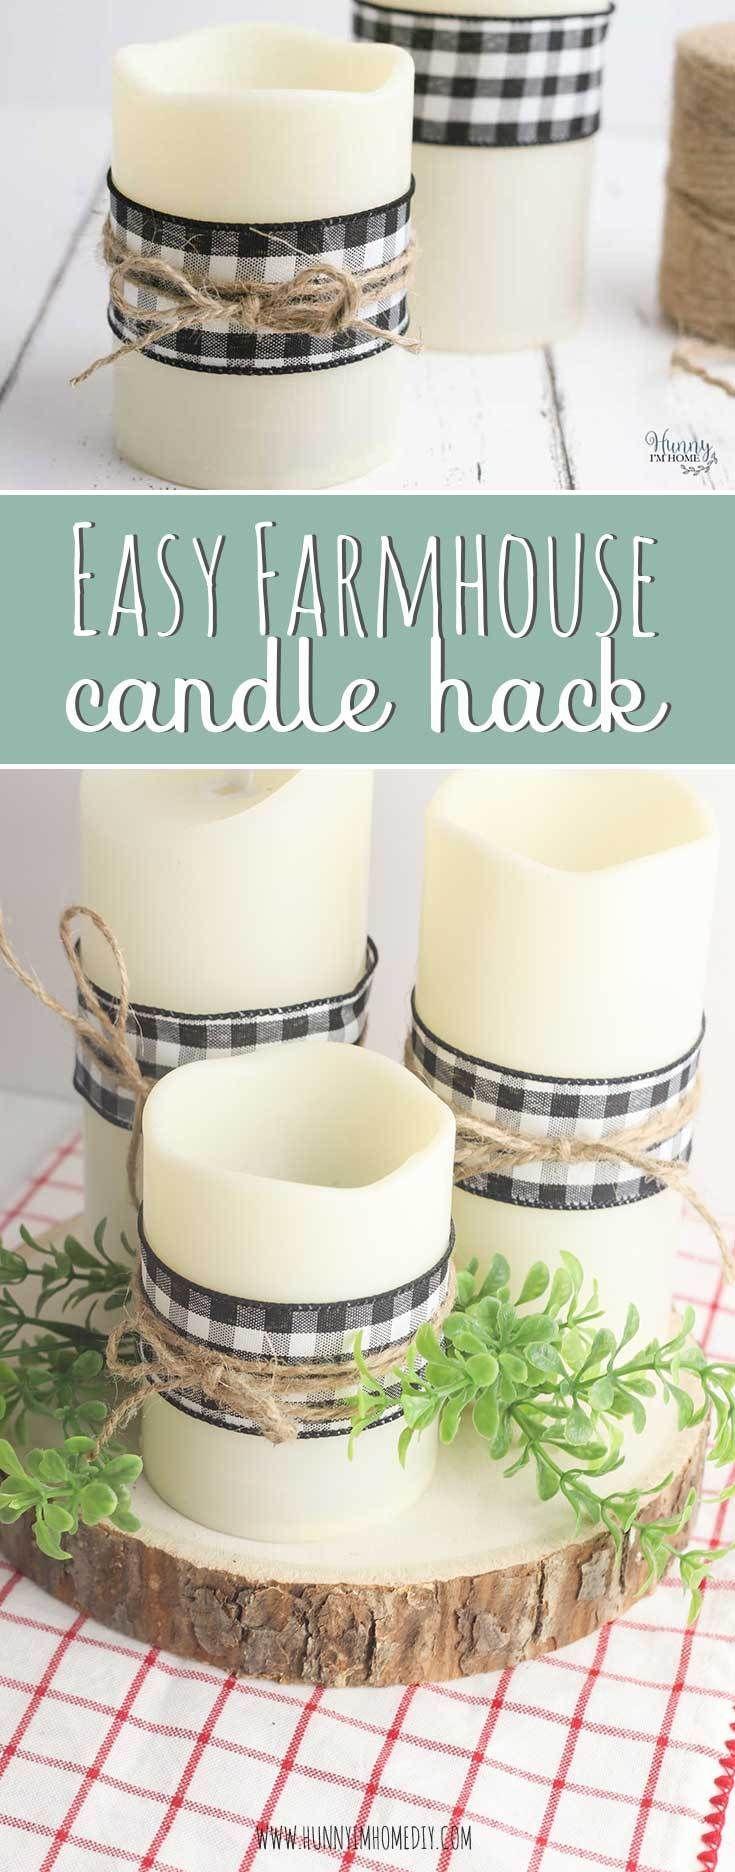 Simple DIY Farmhouse Decor Candle Hack | Easy diy, Farmhouse decor, Diy fireplace